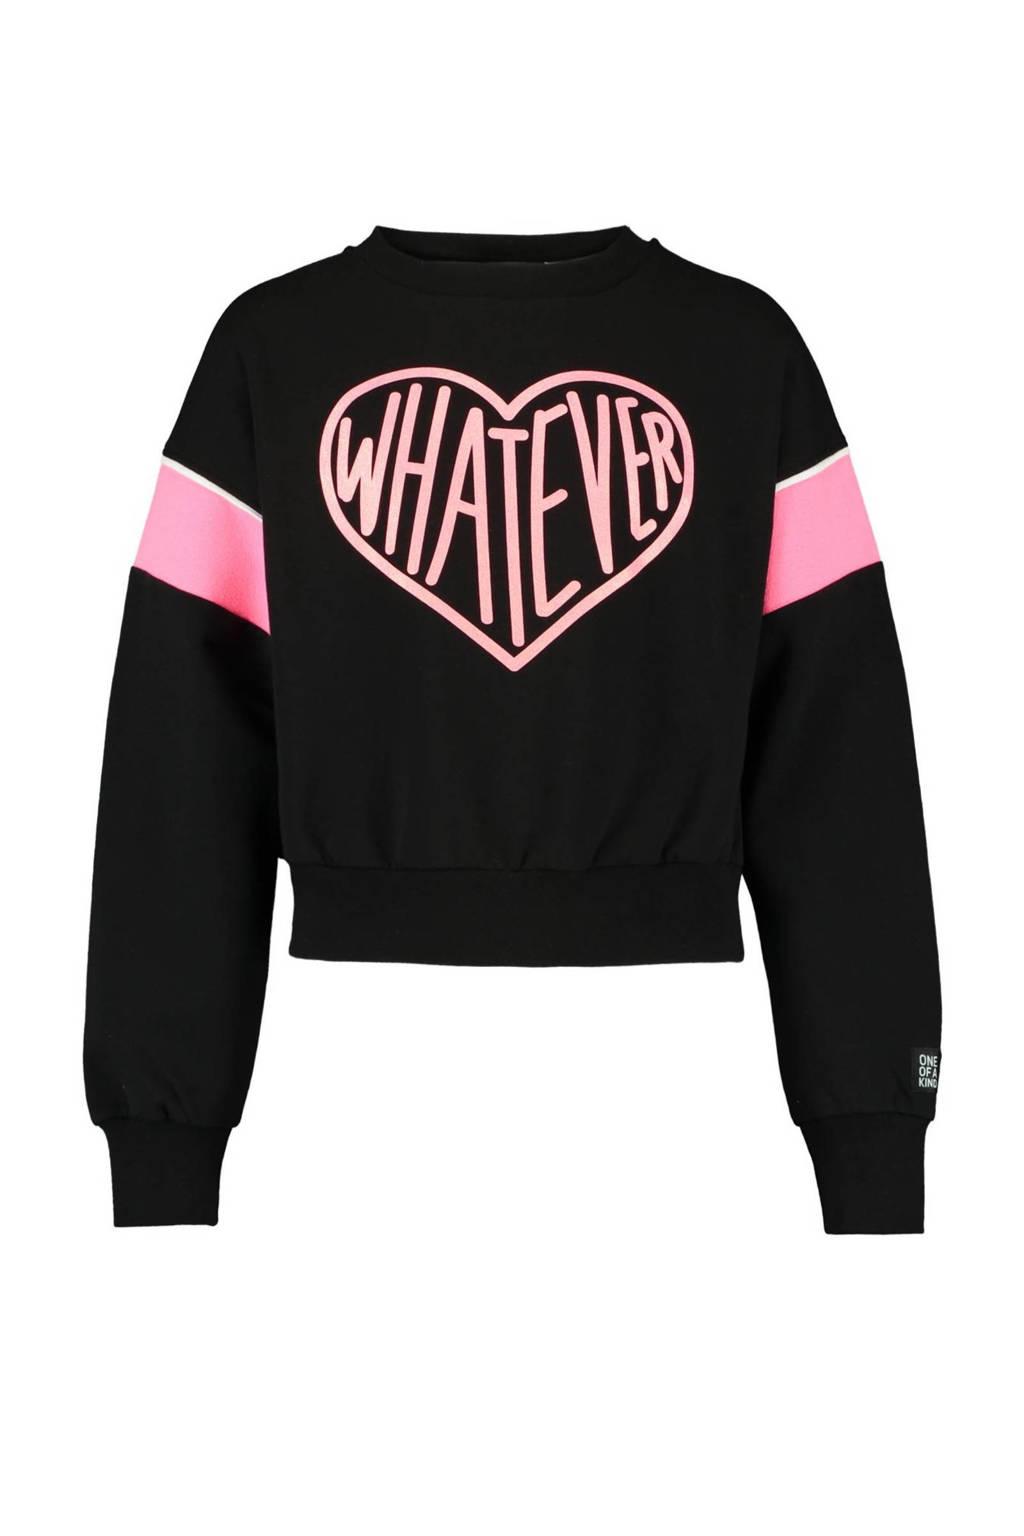 CoolCat Junior cropped sweater Stella met printopdruk zwart/roze, Zwart/roze